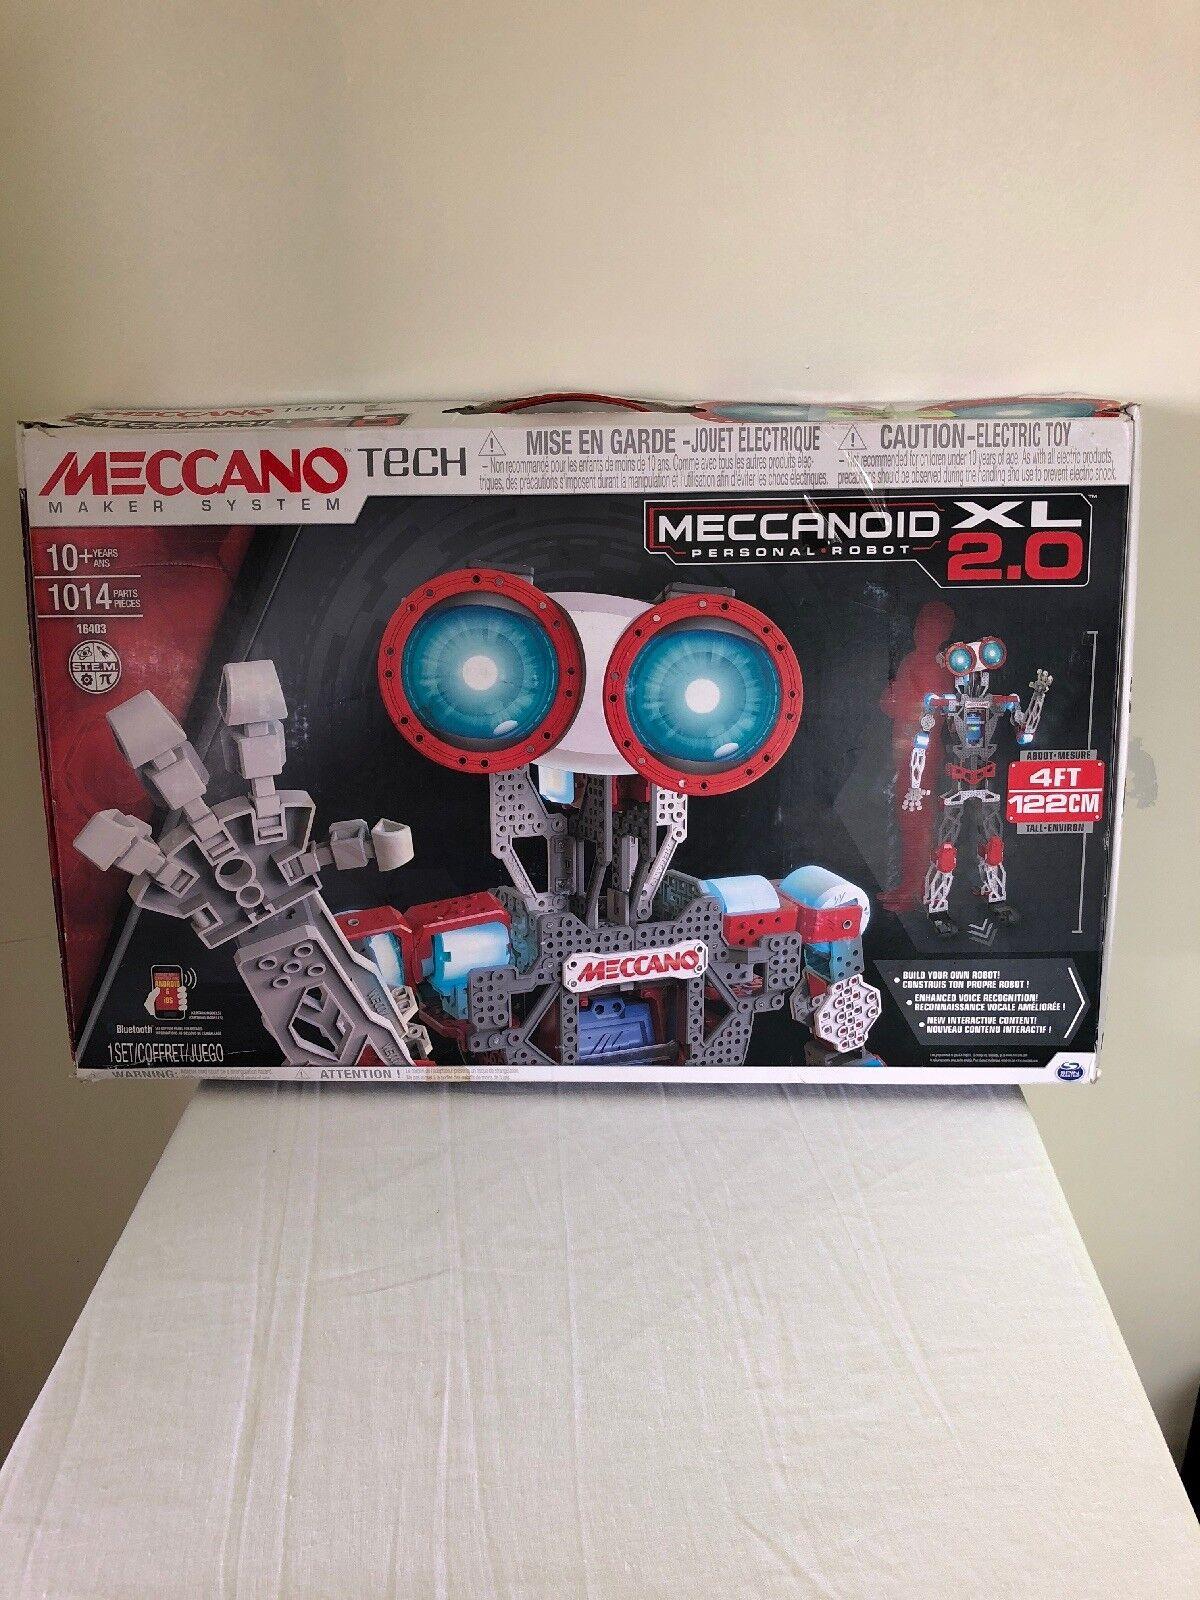 Meccano Tech meccanoid XL 2.0 robot personal